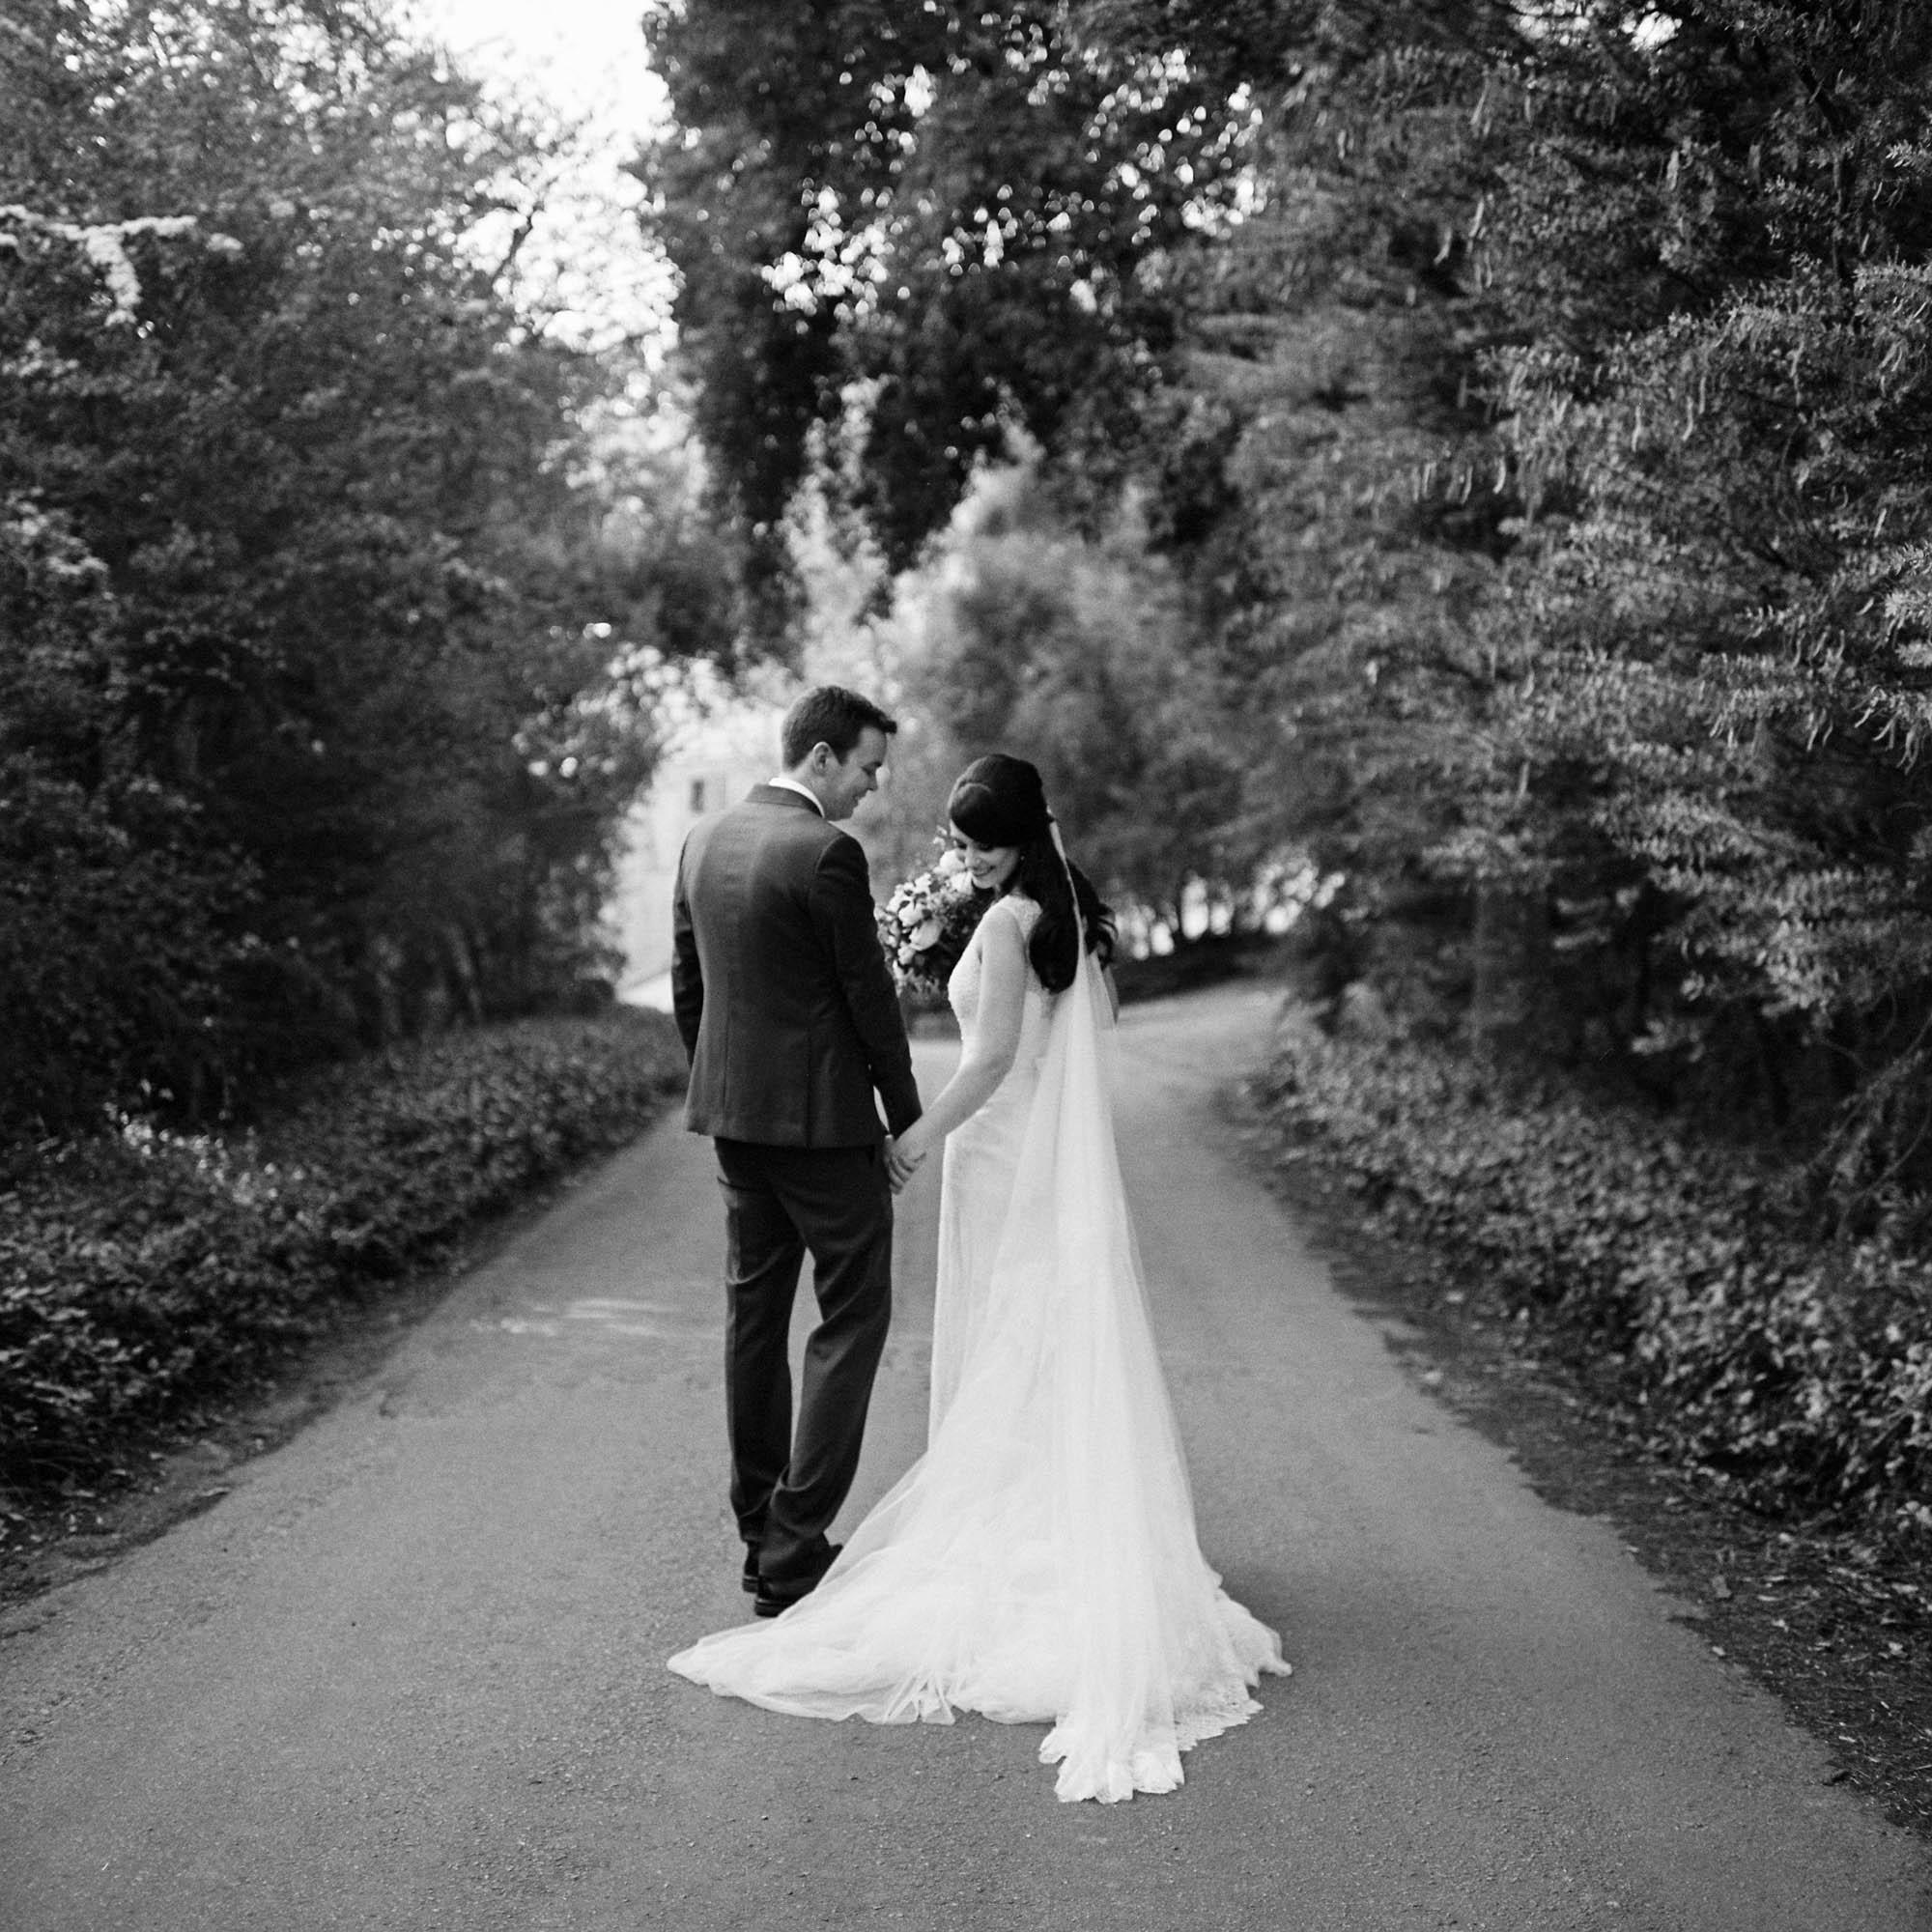 Glen-Ewin-Estate-wedding-photography-064.jpg